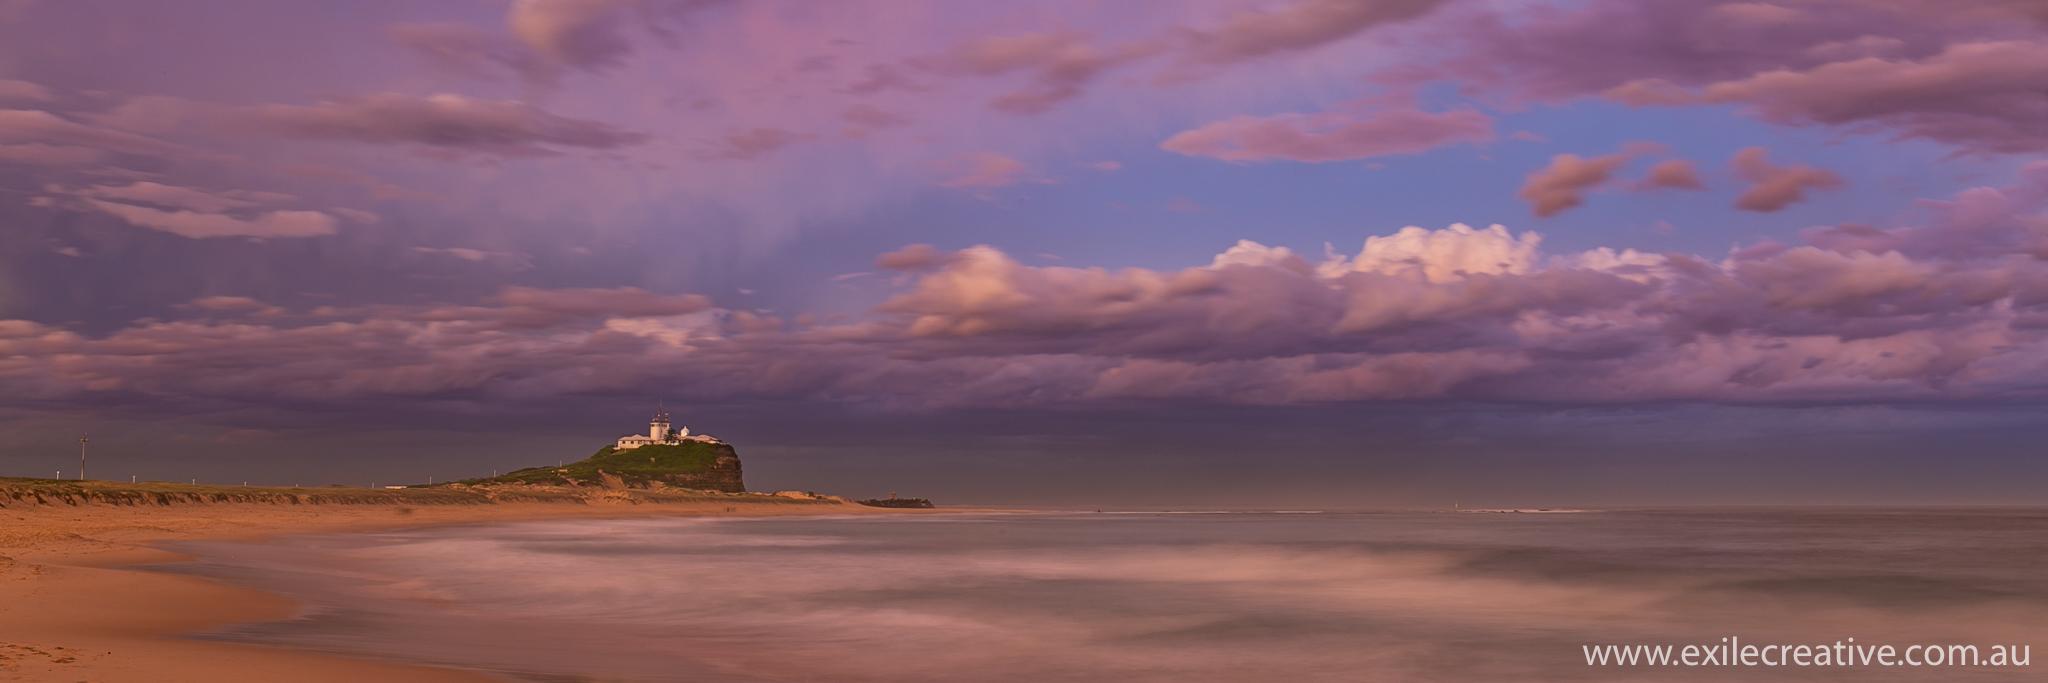 Sunset over Nobby's beach, Newcastle, NSW